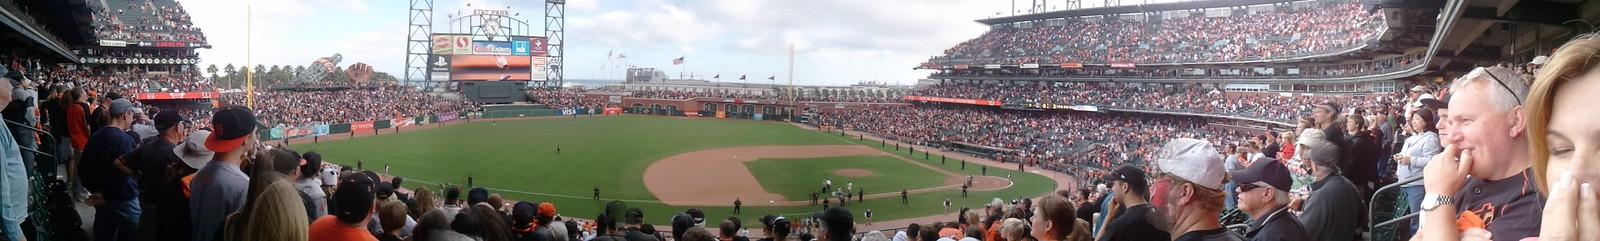 Giants v Padres 10/3/10